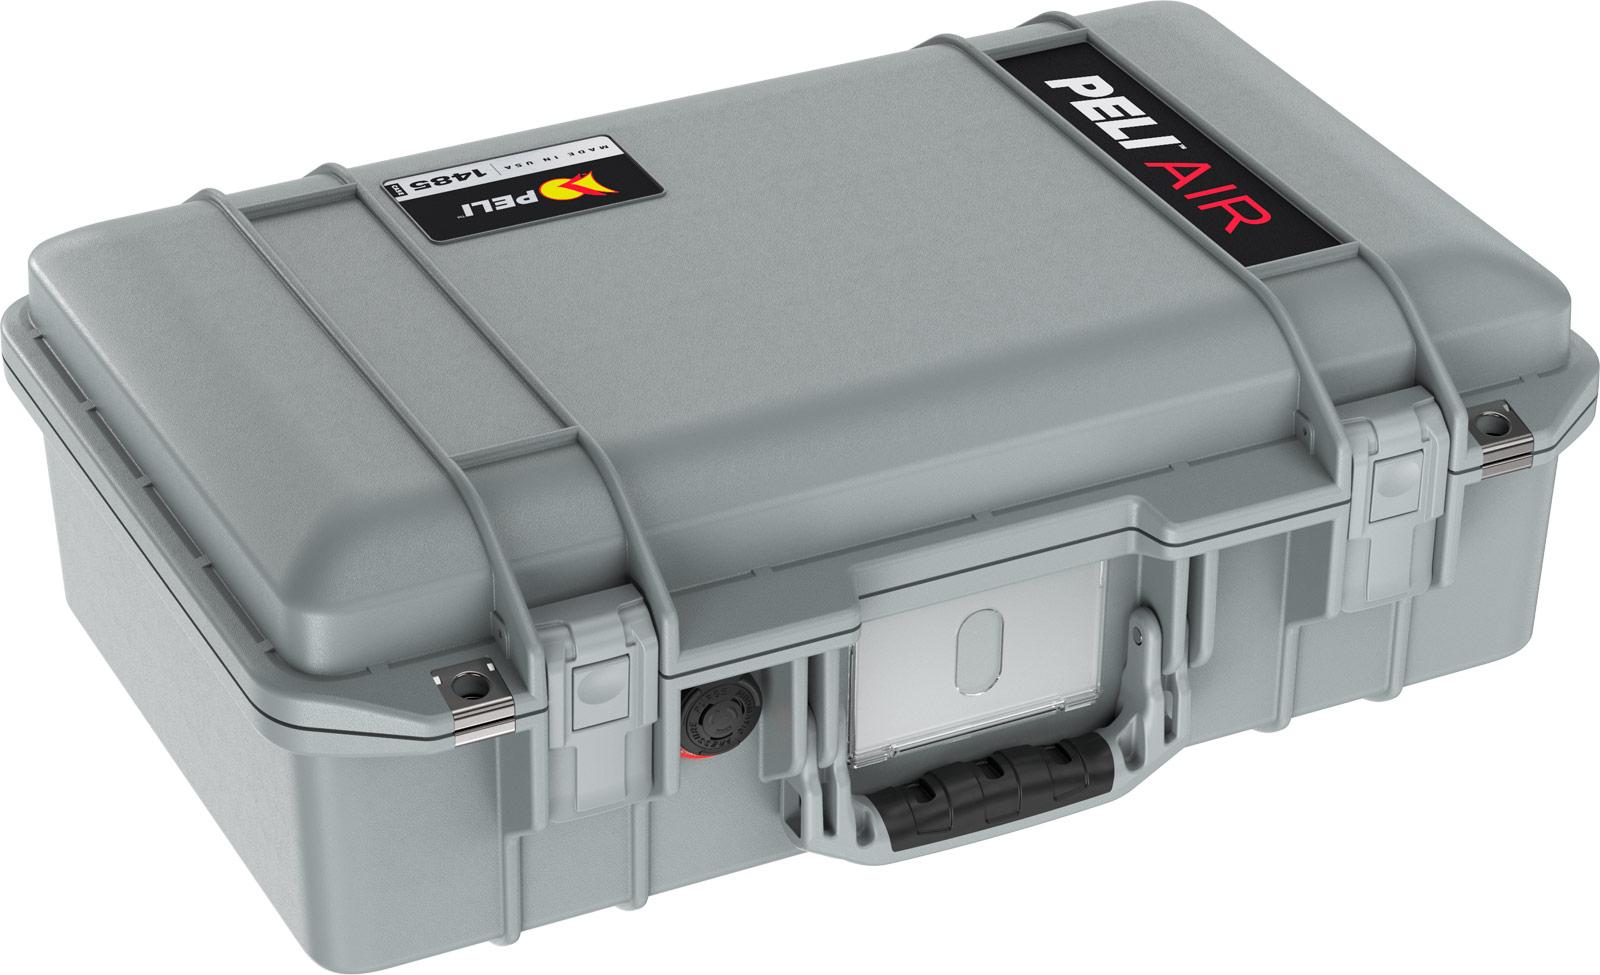 peli air case 1485 grey carrying cases